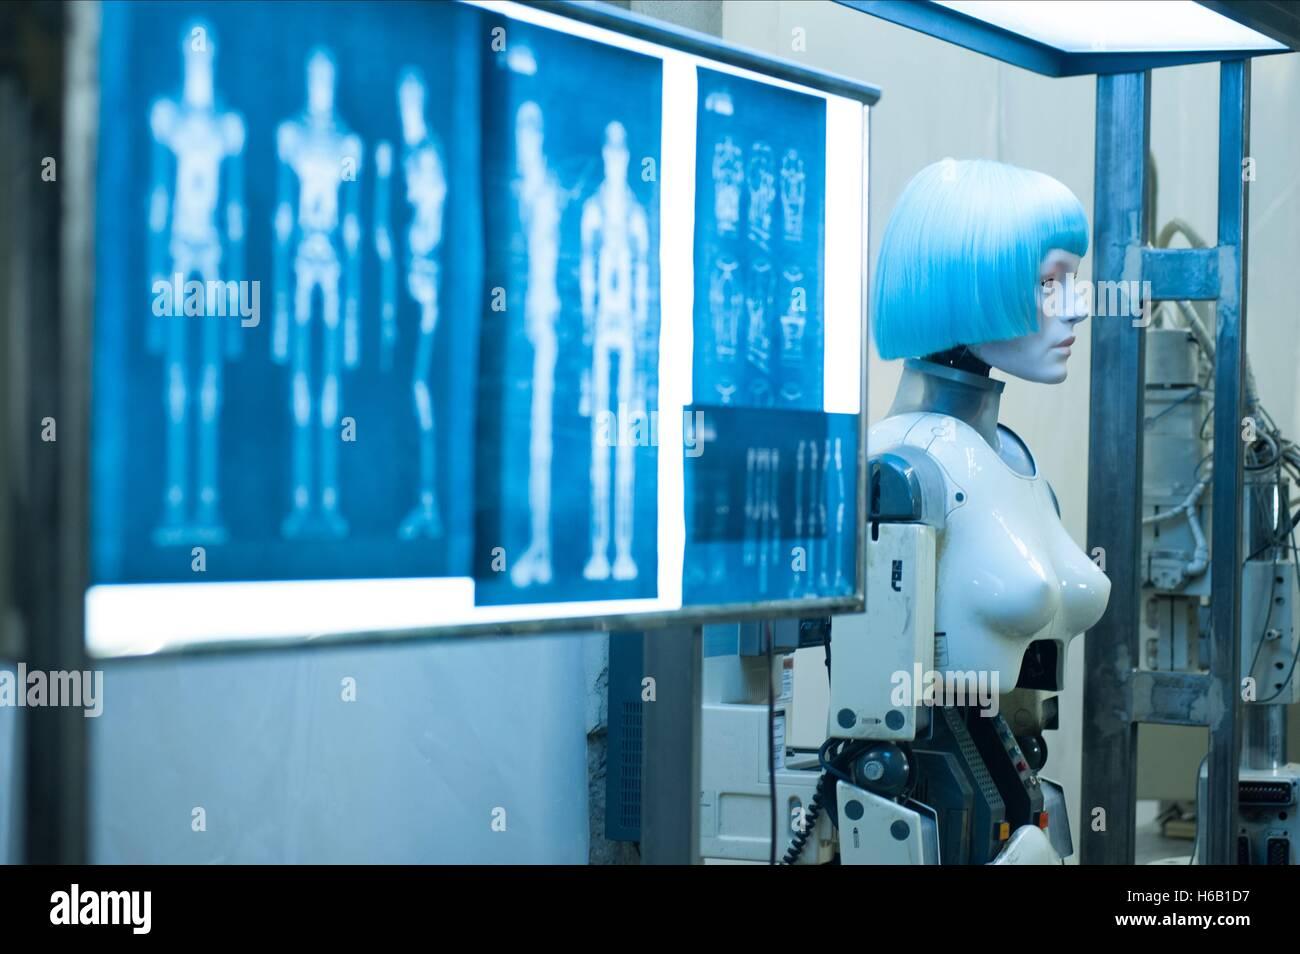 HUMANOID PILGRIM ROBOT AUTOMATA (2014) - Stock Image